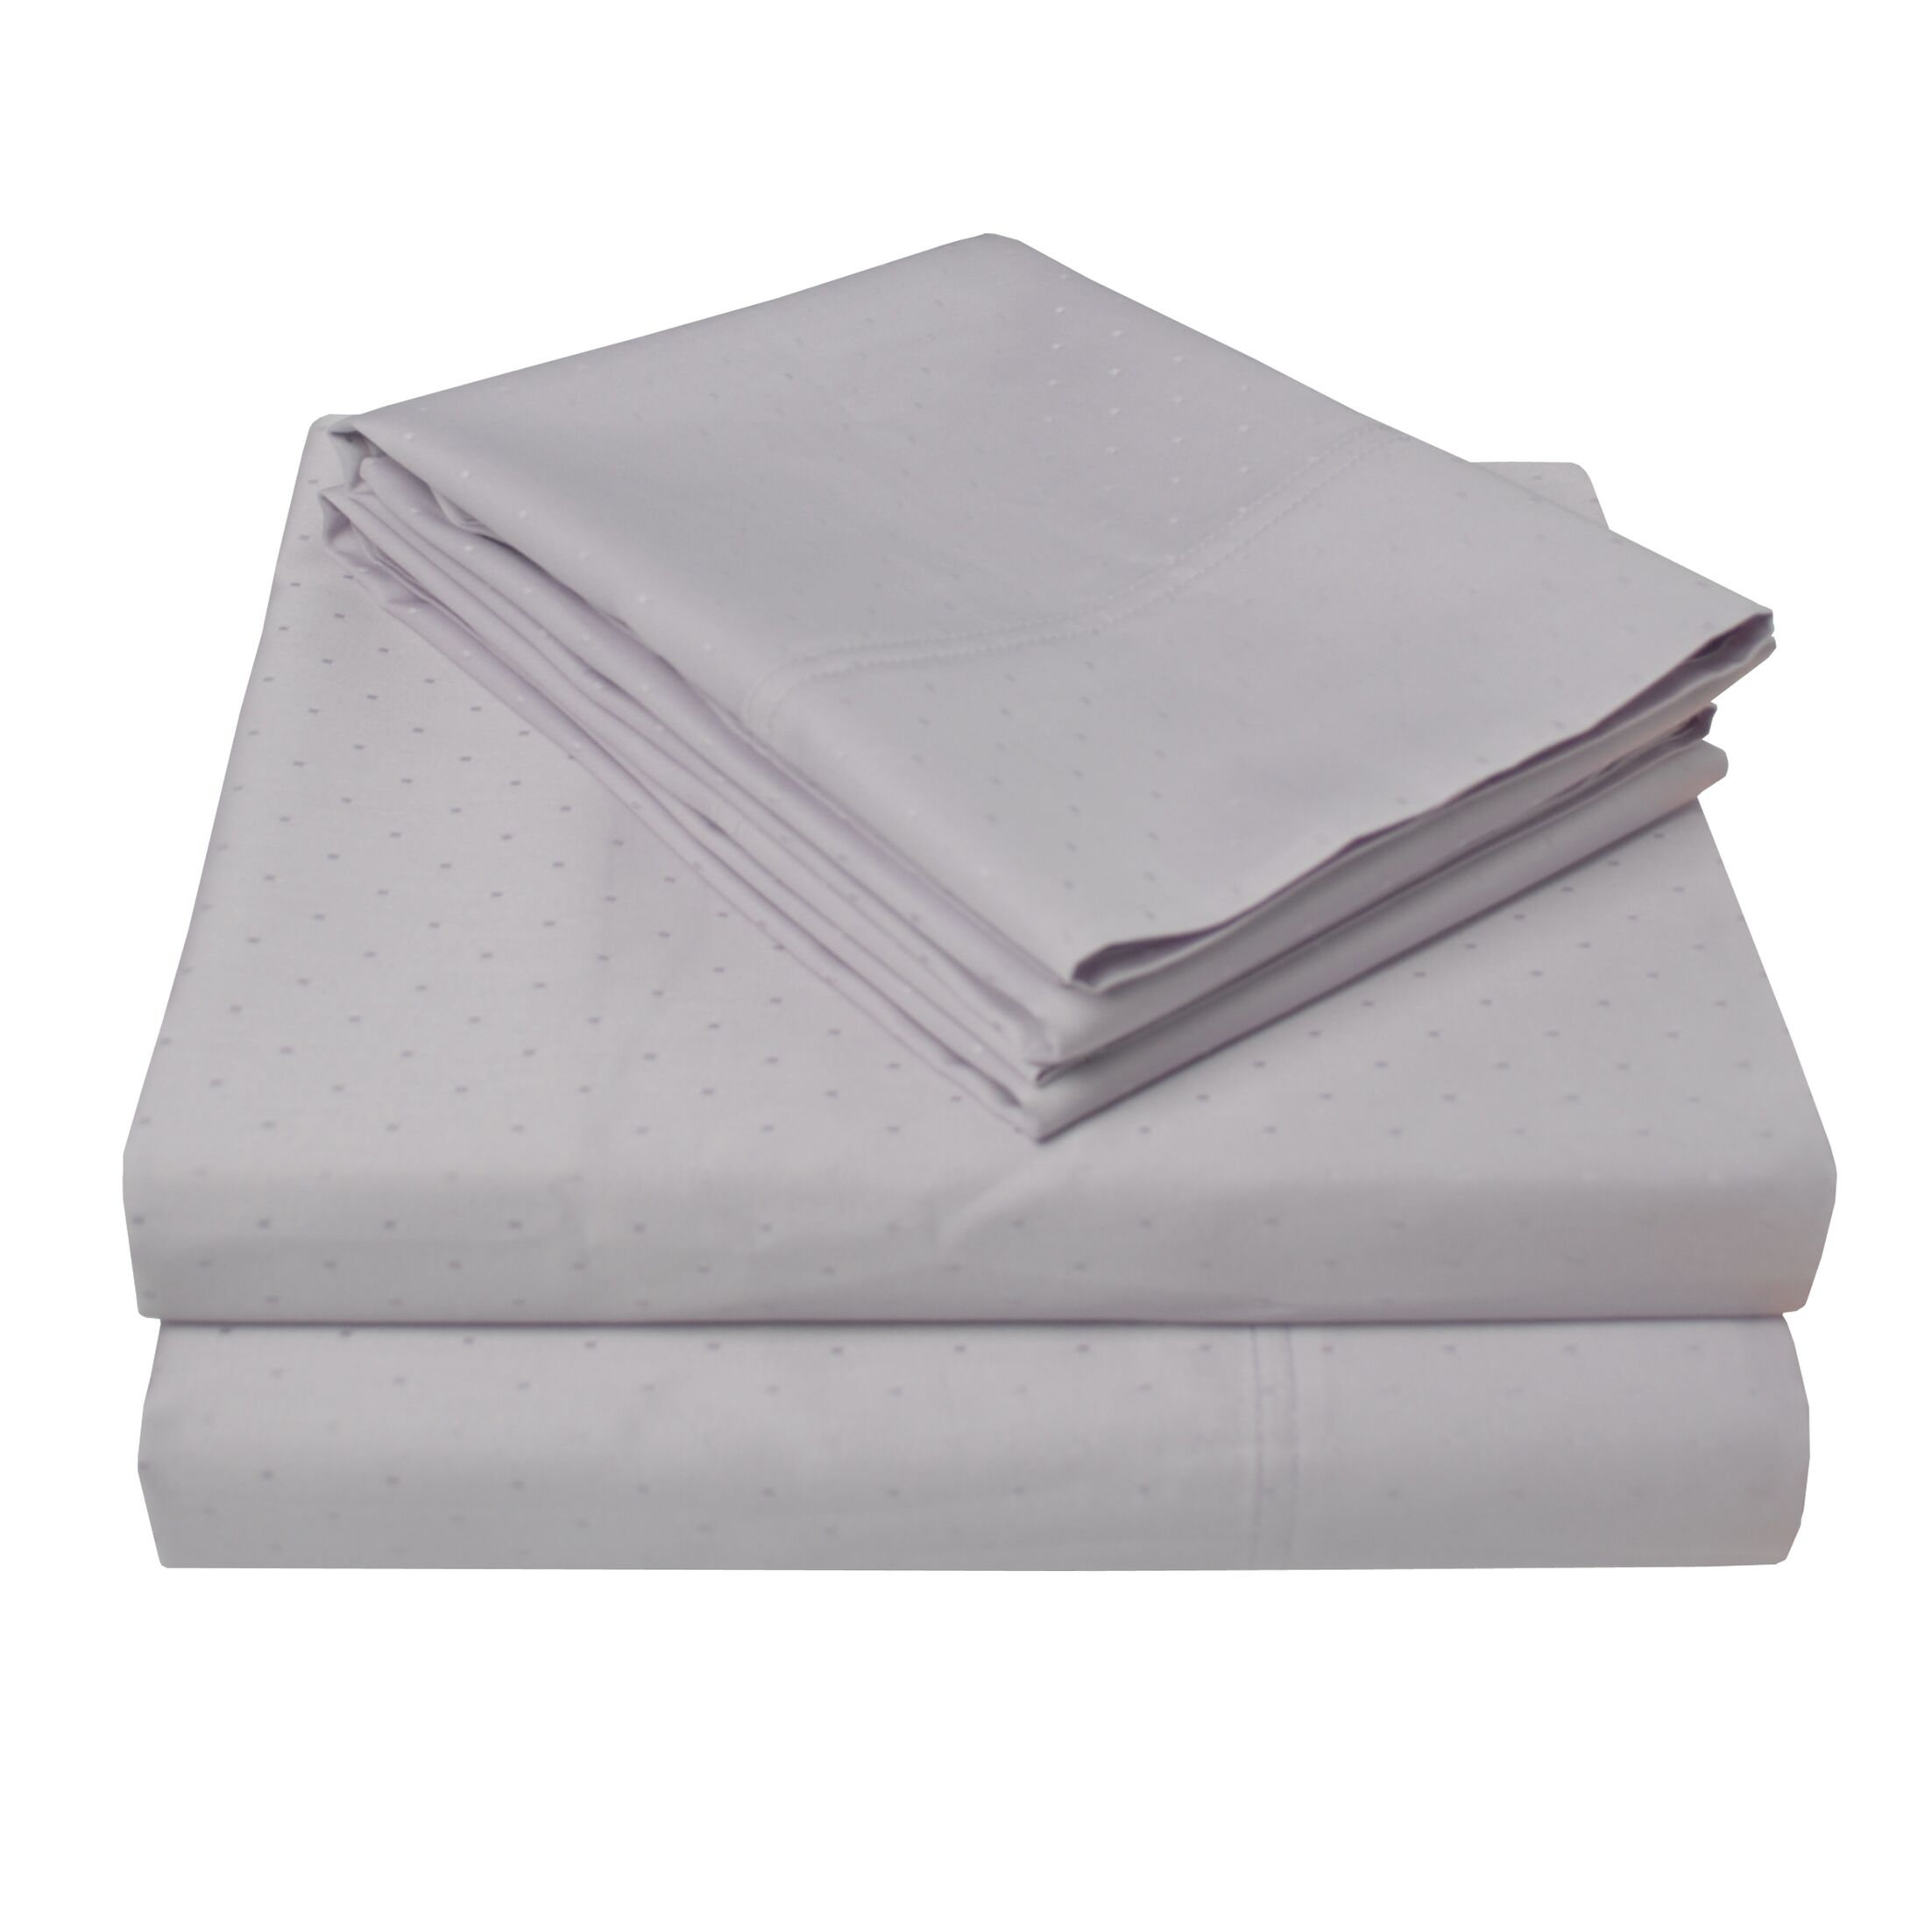 4 Piece 400 Thread Count 100% Cotton Sheet Set Color: Lilac, Size: California King